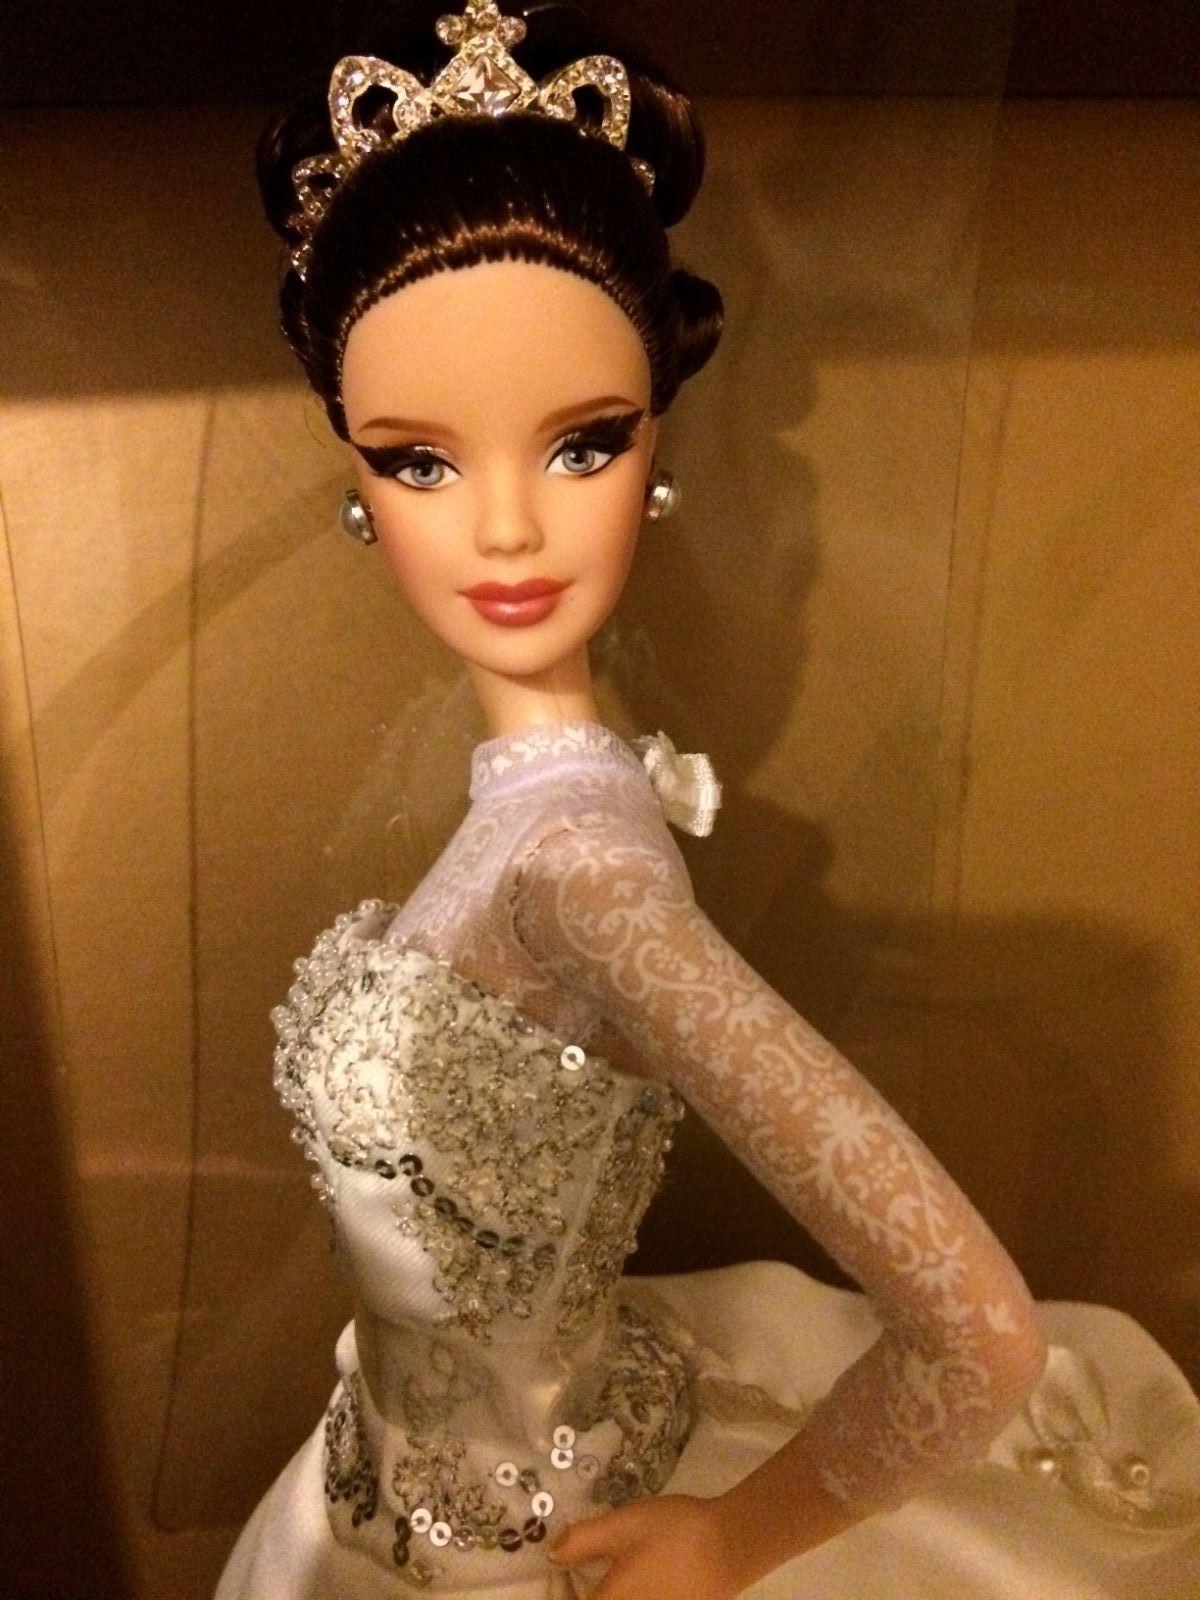 Gold label, Reem acra barbie doll | eBay | Barbies Brides Novias ...